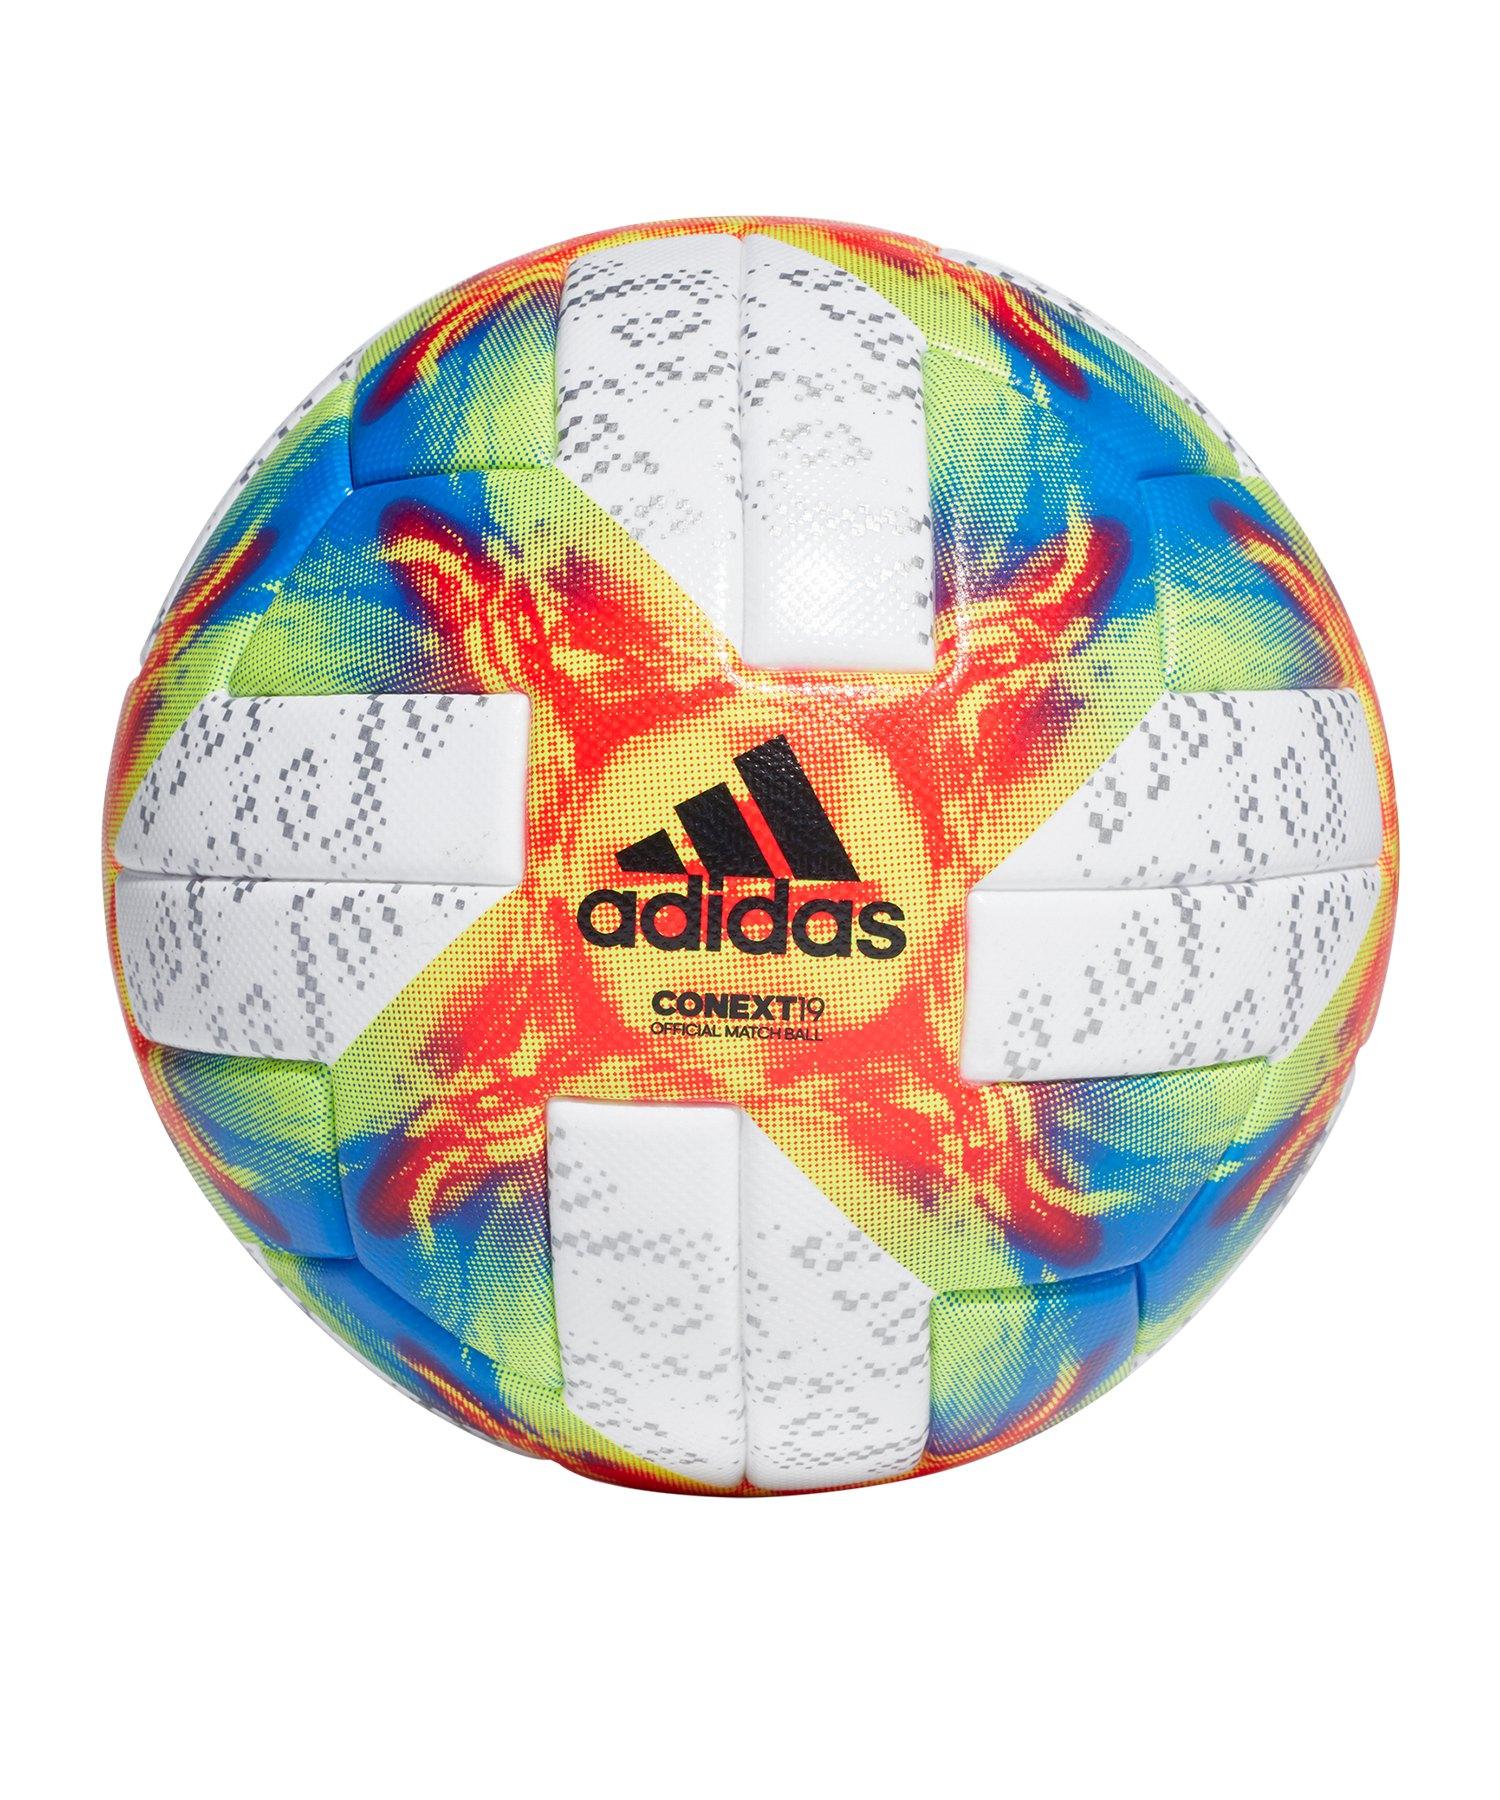 Adidas Conext 19 Top Training Fussball Fussbälle